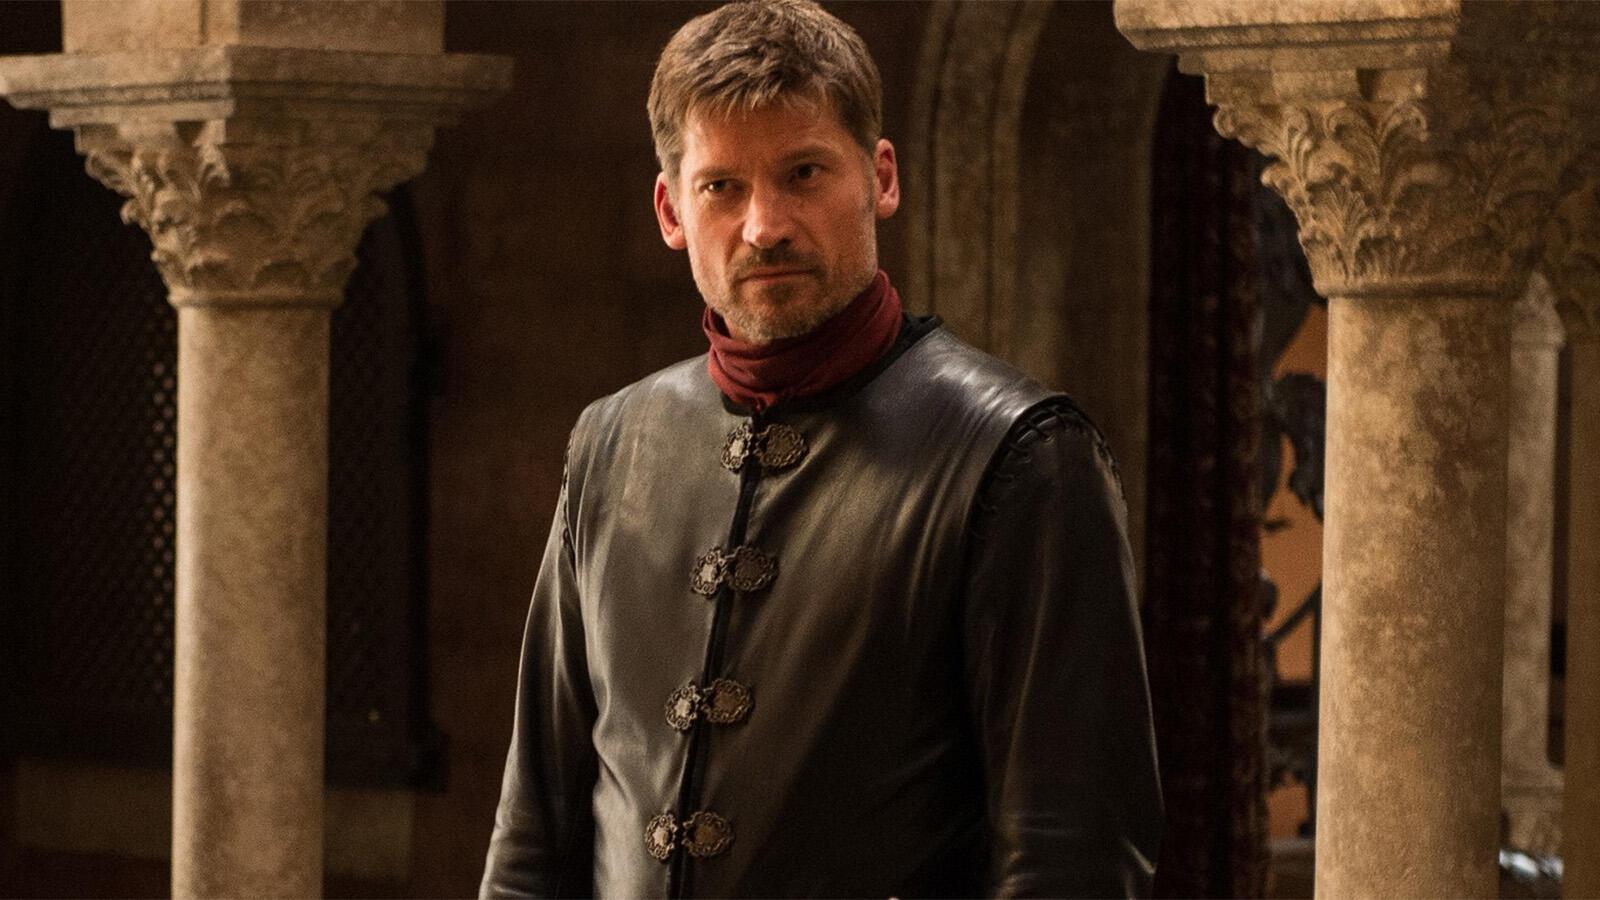 Nikolaj Coster-Waldau, Game of Thrones